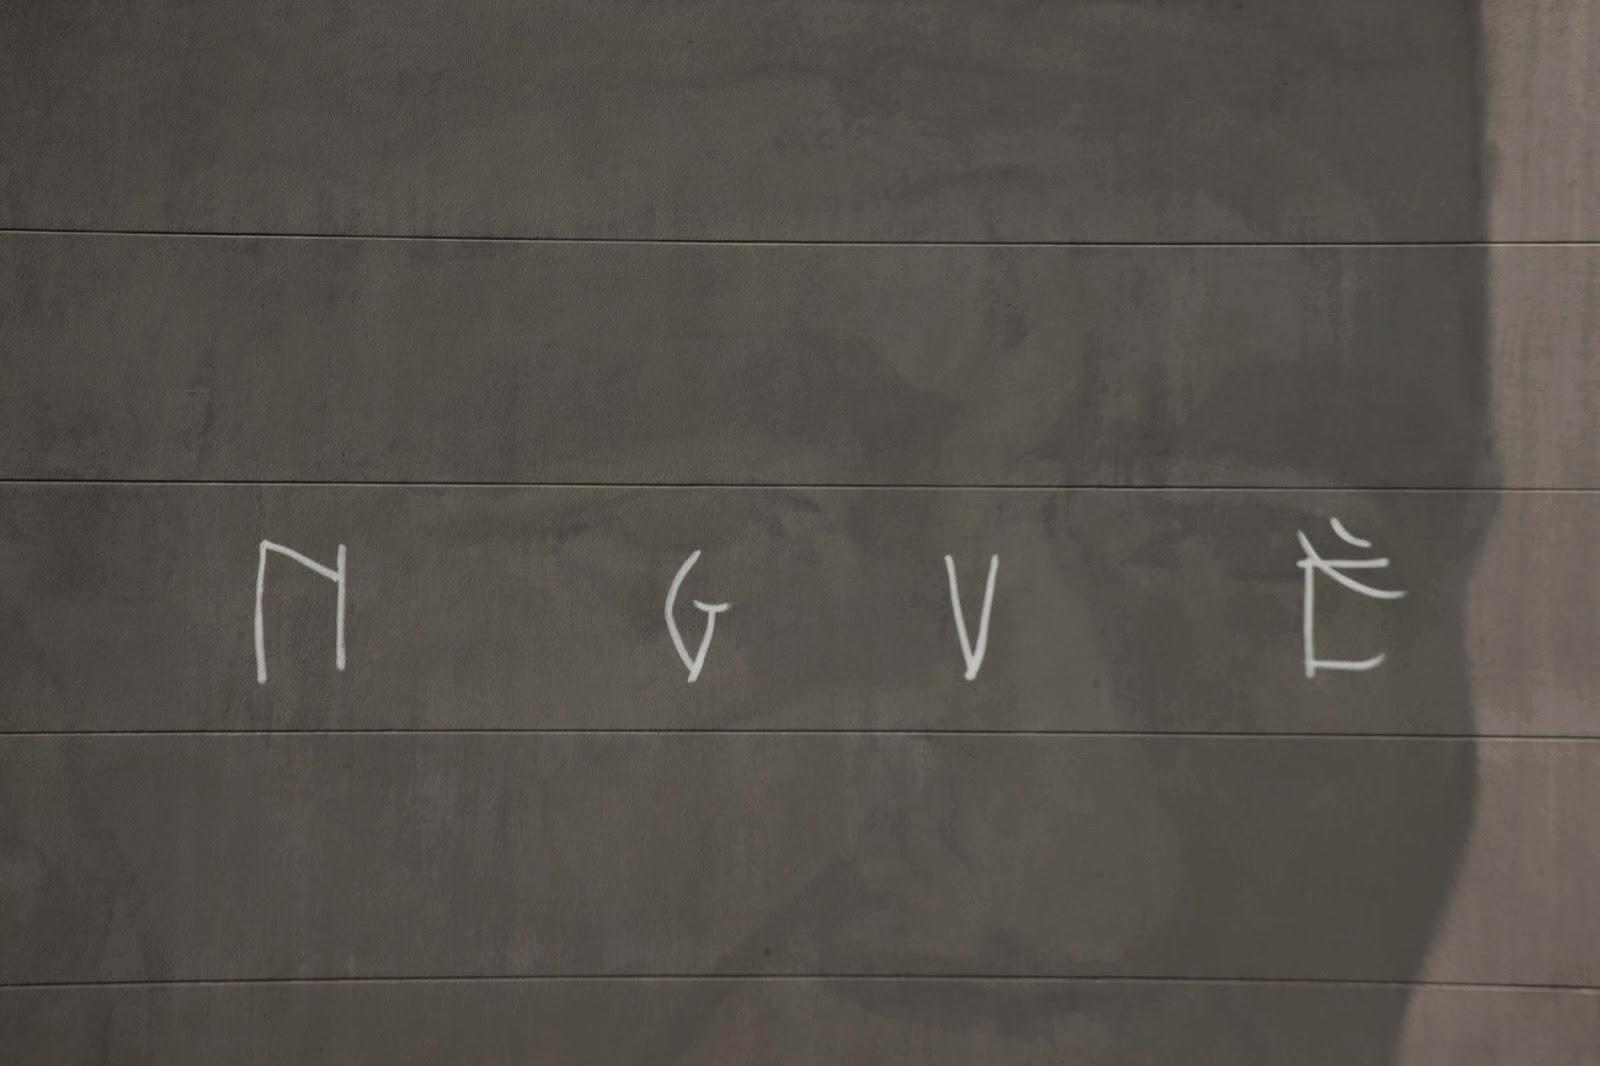 axel-void-new-mural-for-desordes-creativas-2014-04